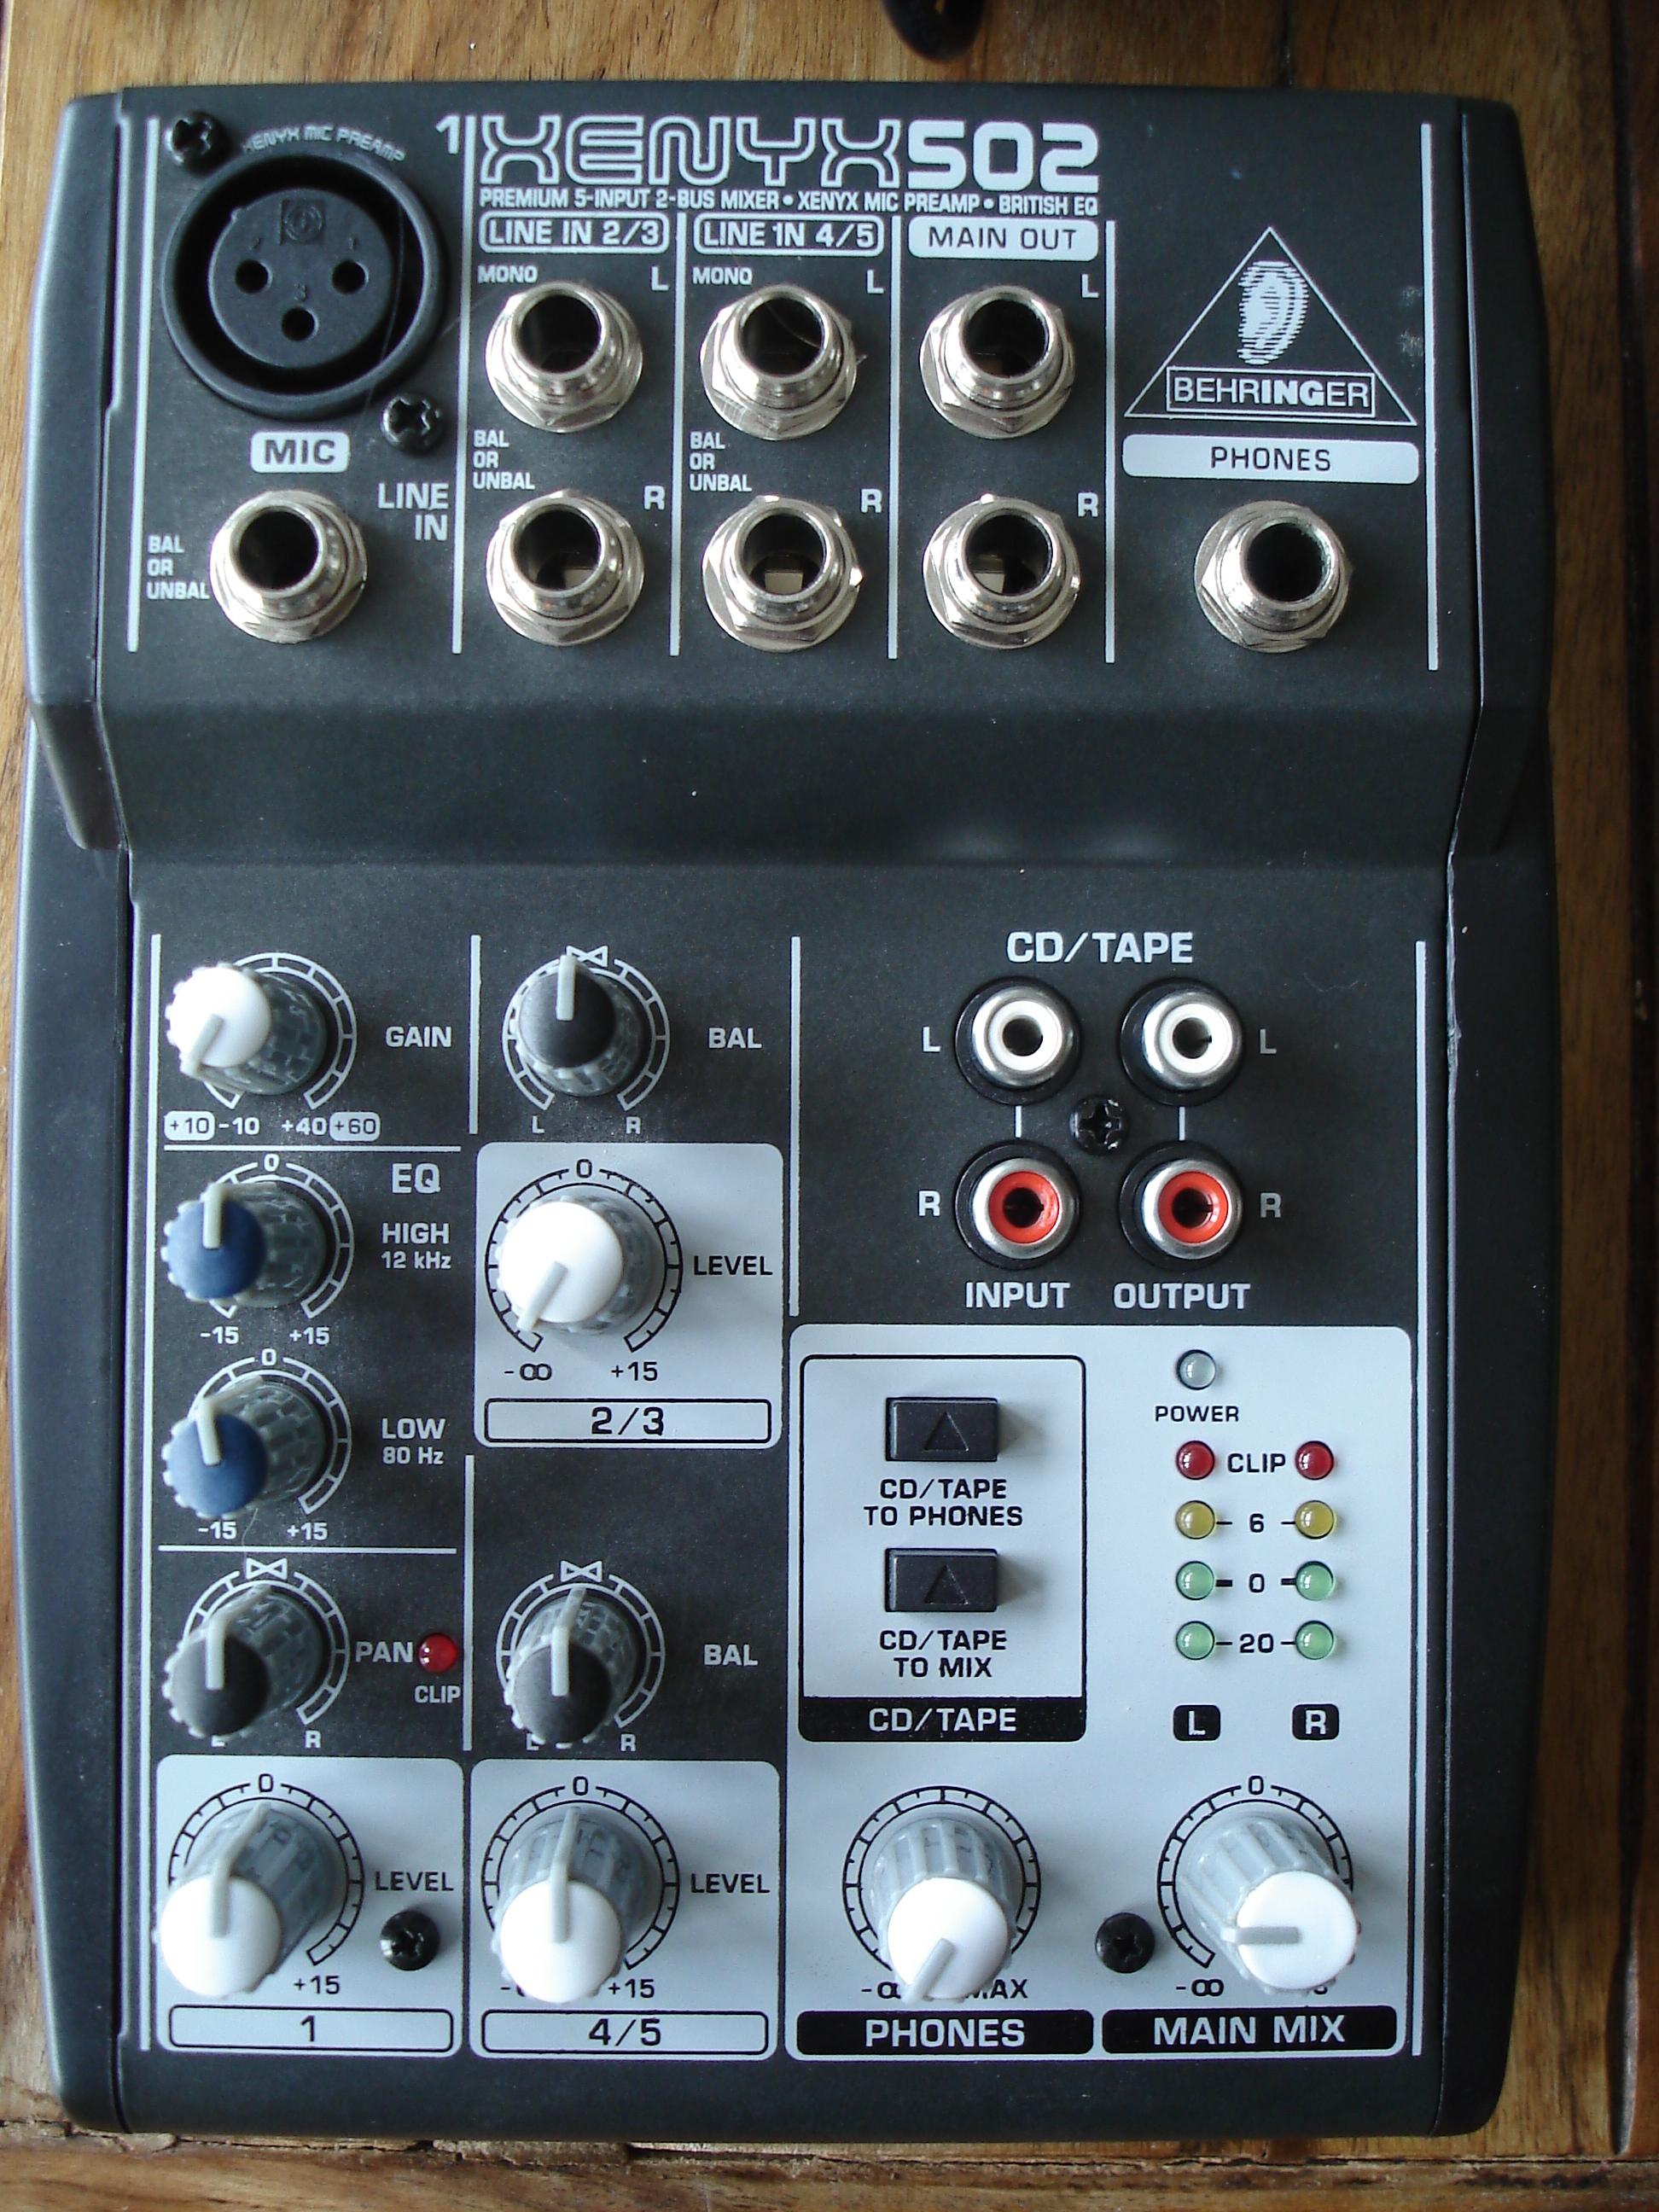 Behringer Xenyx 502 image (#526067) - Audiofanzine